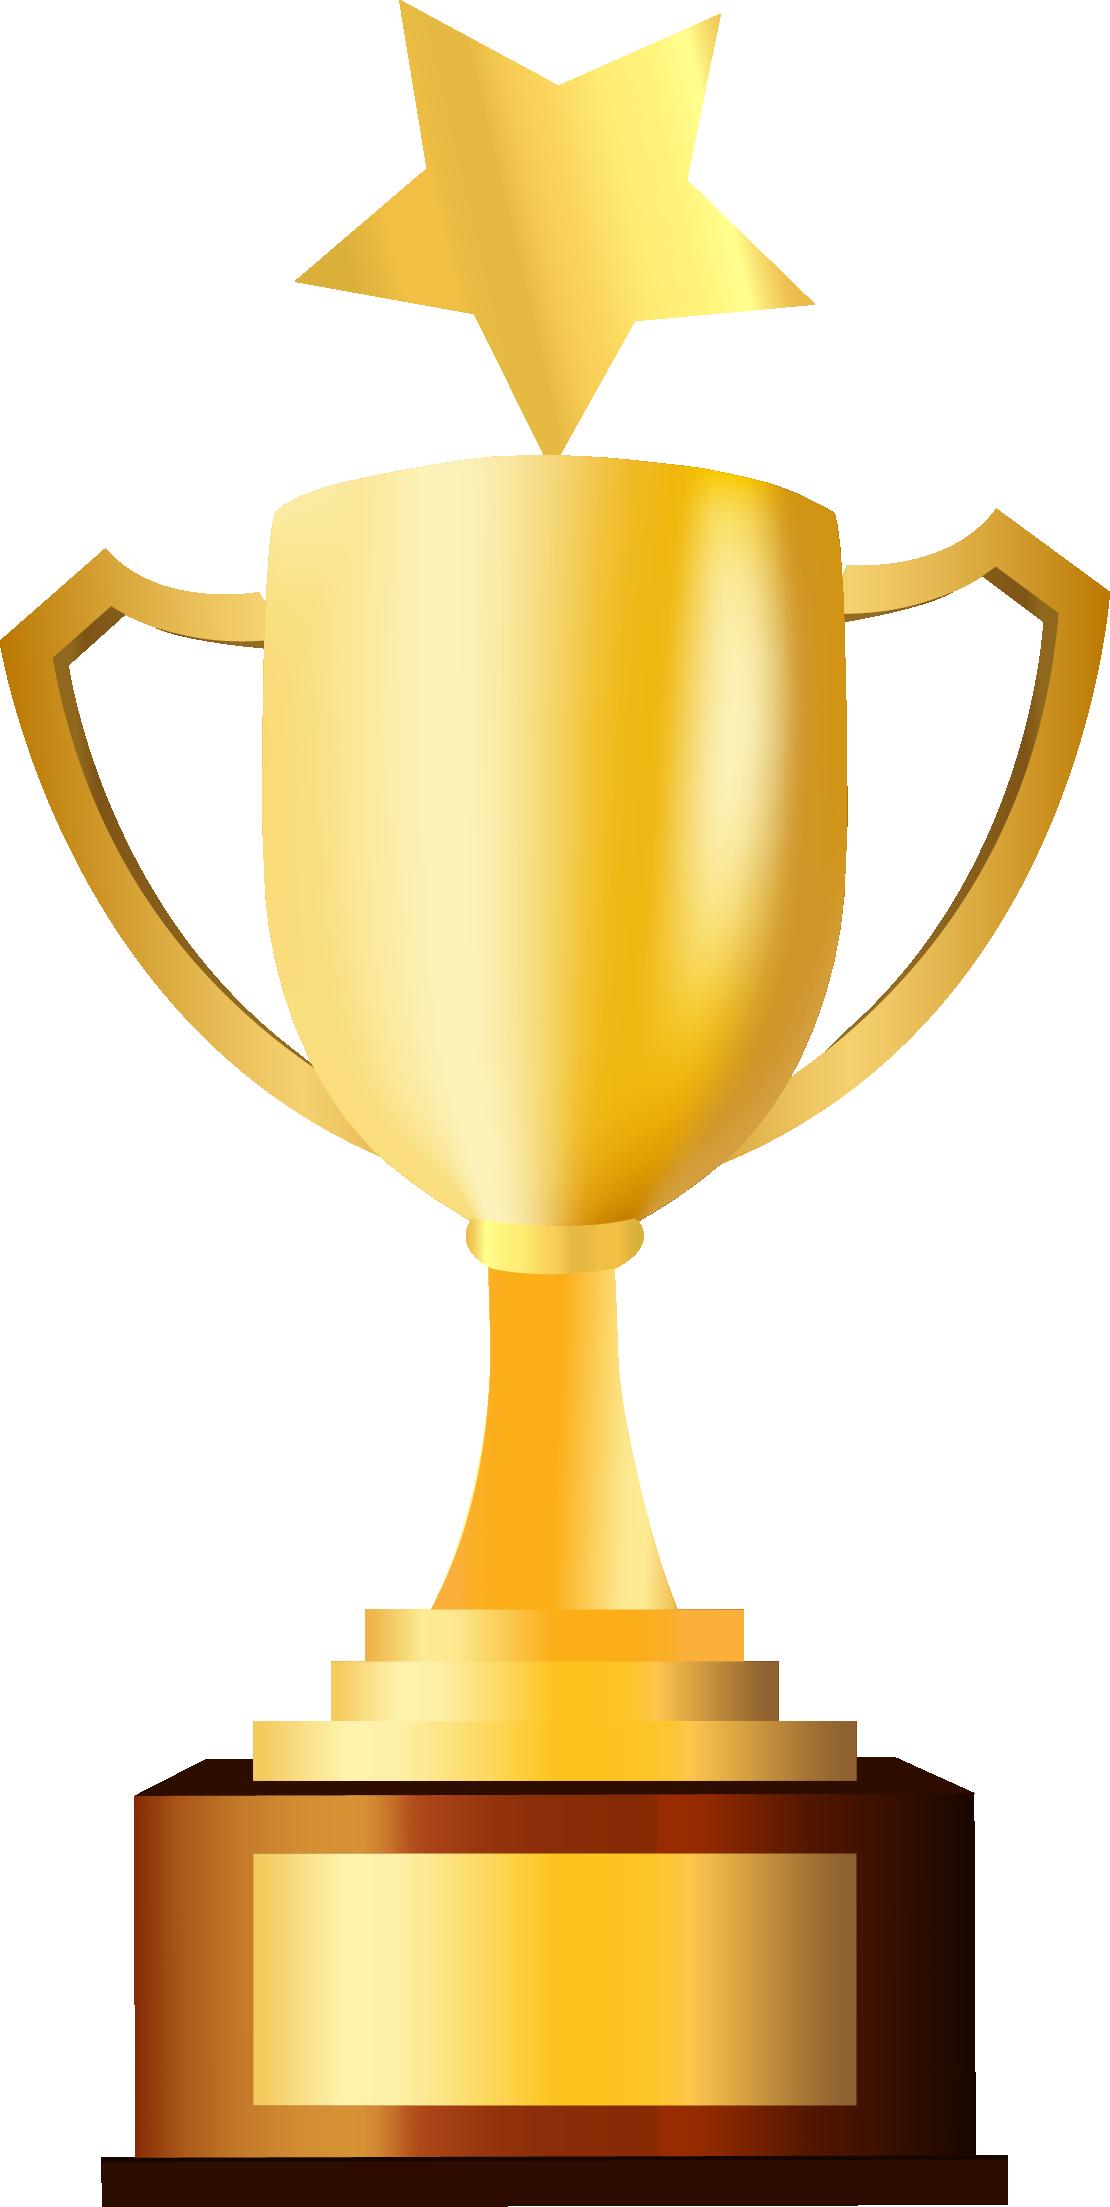 Clipart gold star award svg freeuse download Trophy Prize Clip art - Golden five pointed star trophy 1110*2207 ... svg freeuse download